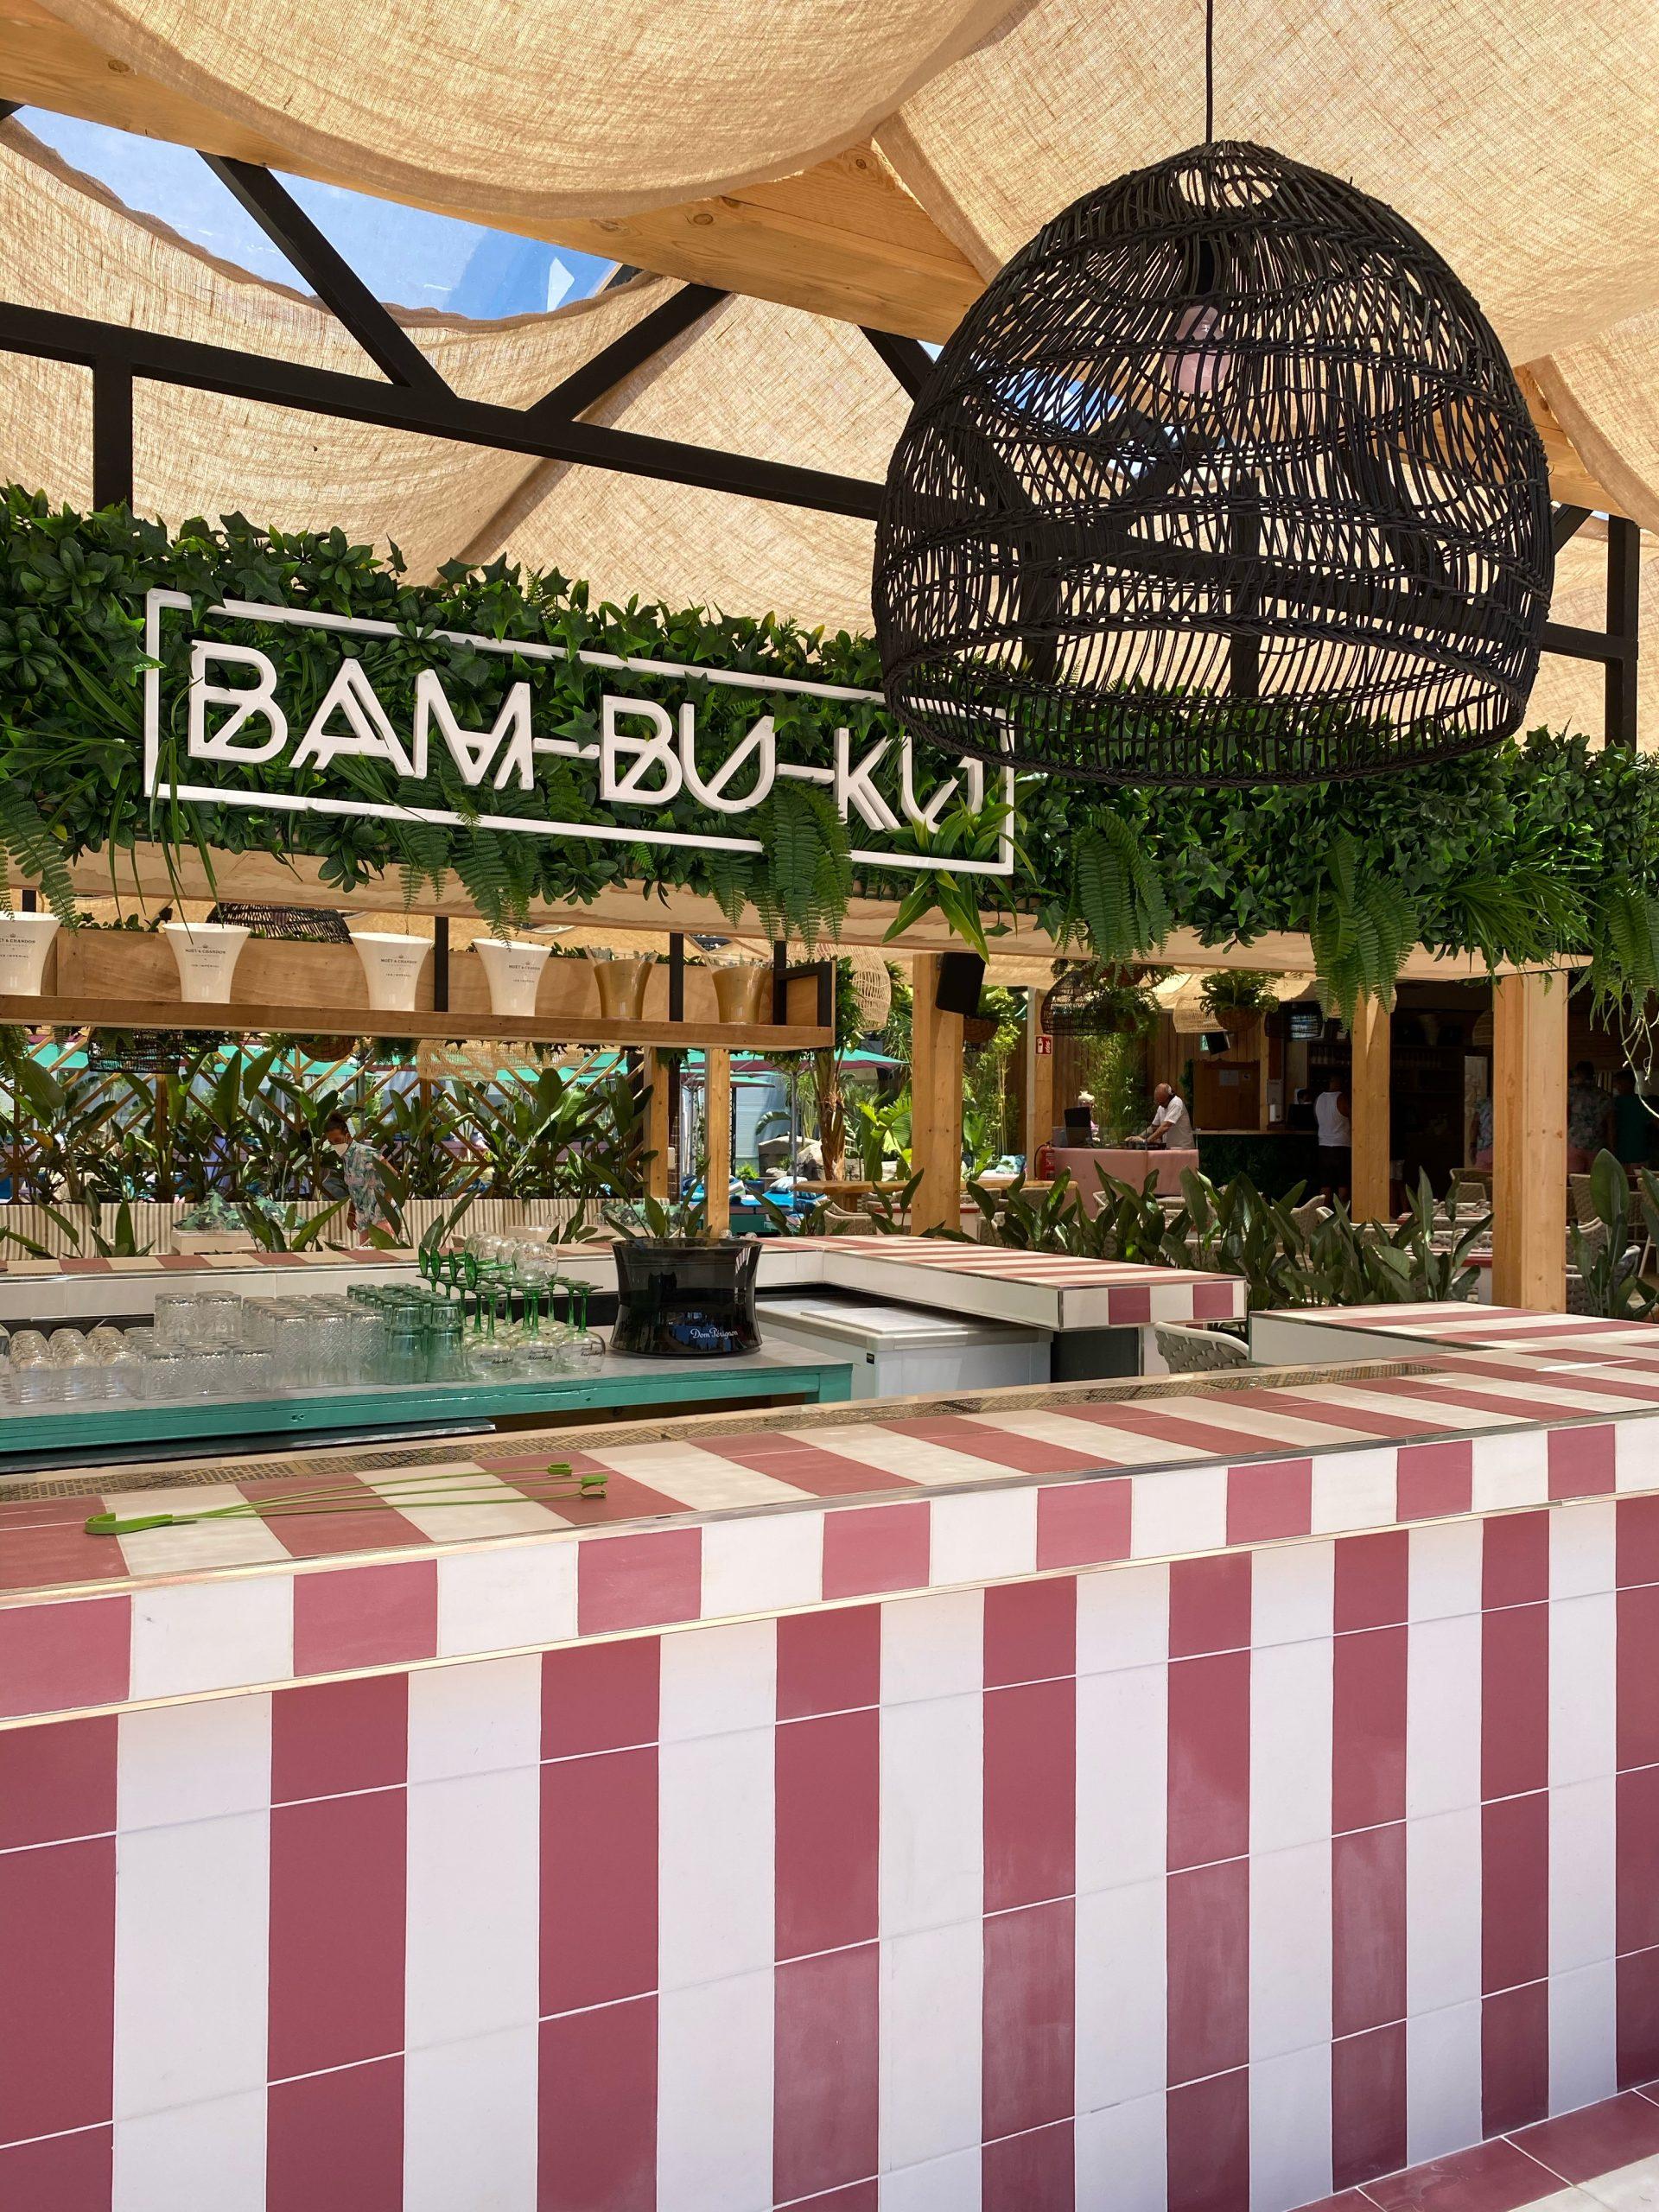 Bamkuku Ibiza 1